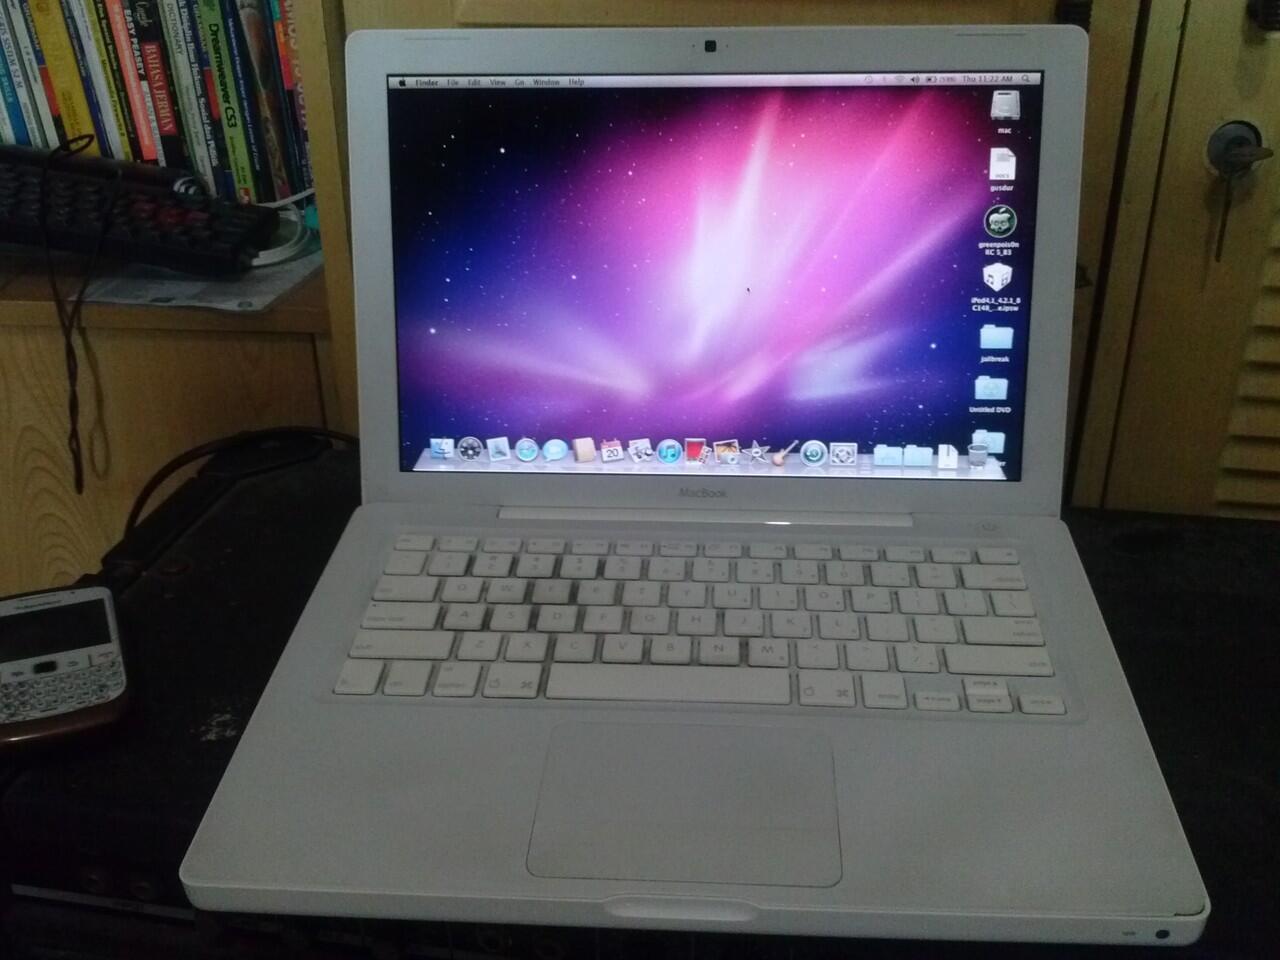 Macbook 2.1 white mulus bersih